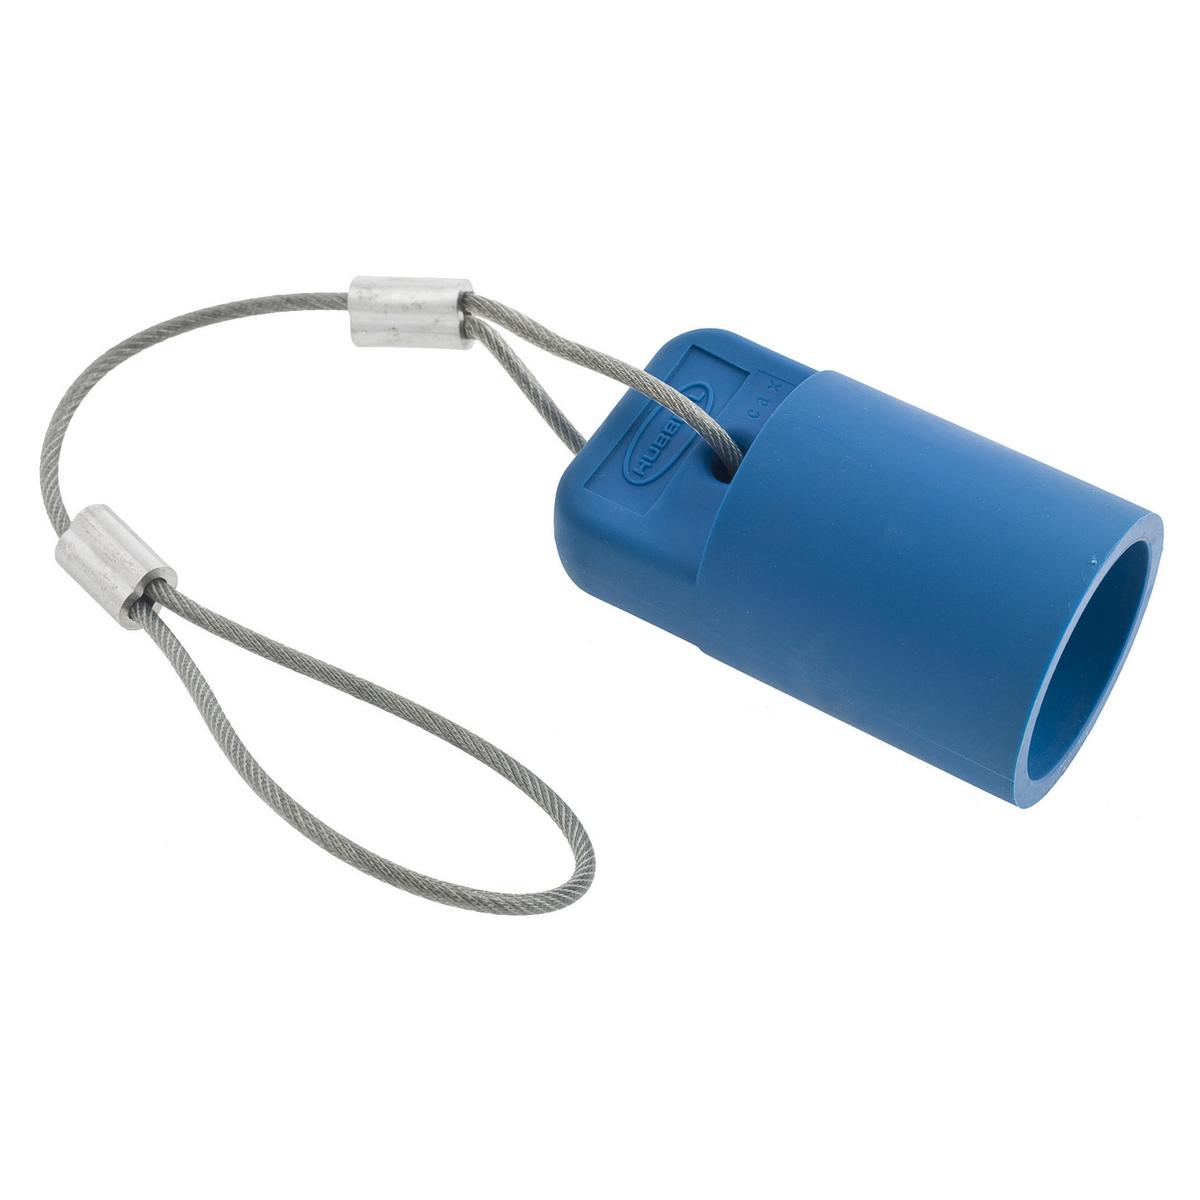 Hubbell HBLFCAPBL Blue FeMale Cam Type Plug/Receptacle Protective Cap